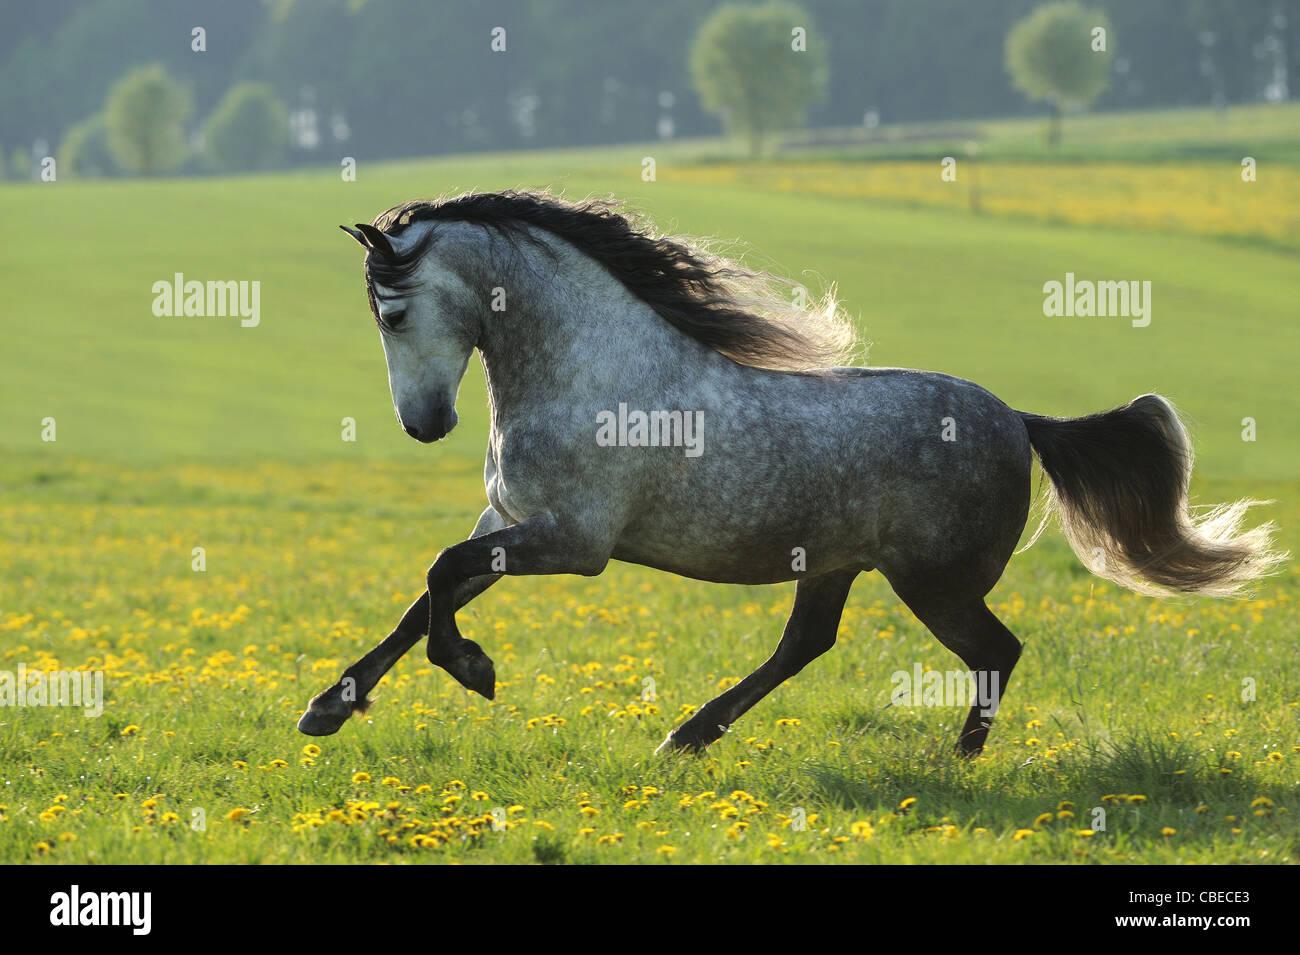 Caballo Andaluz (Equus ferus caballus). Manchan castrado gris en un galope en una pradera. Imagen De Stock